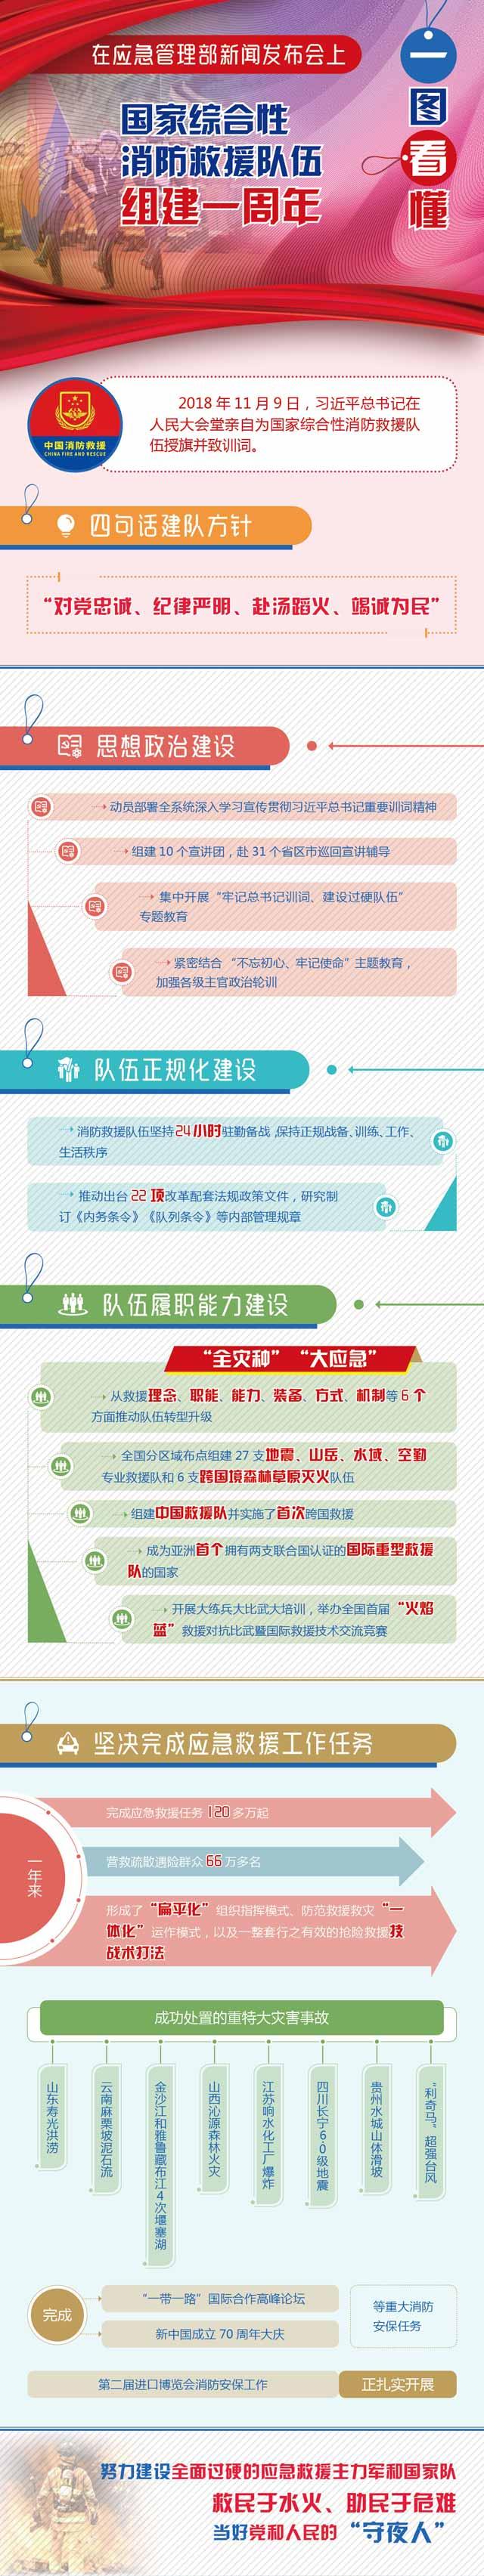 http://www.axxxc.com/nenyuananquan/1056246.html